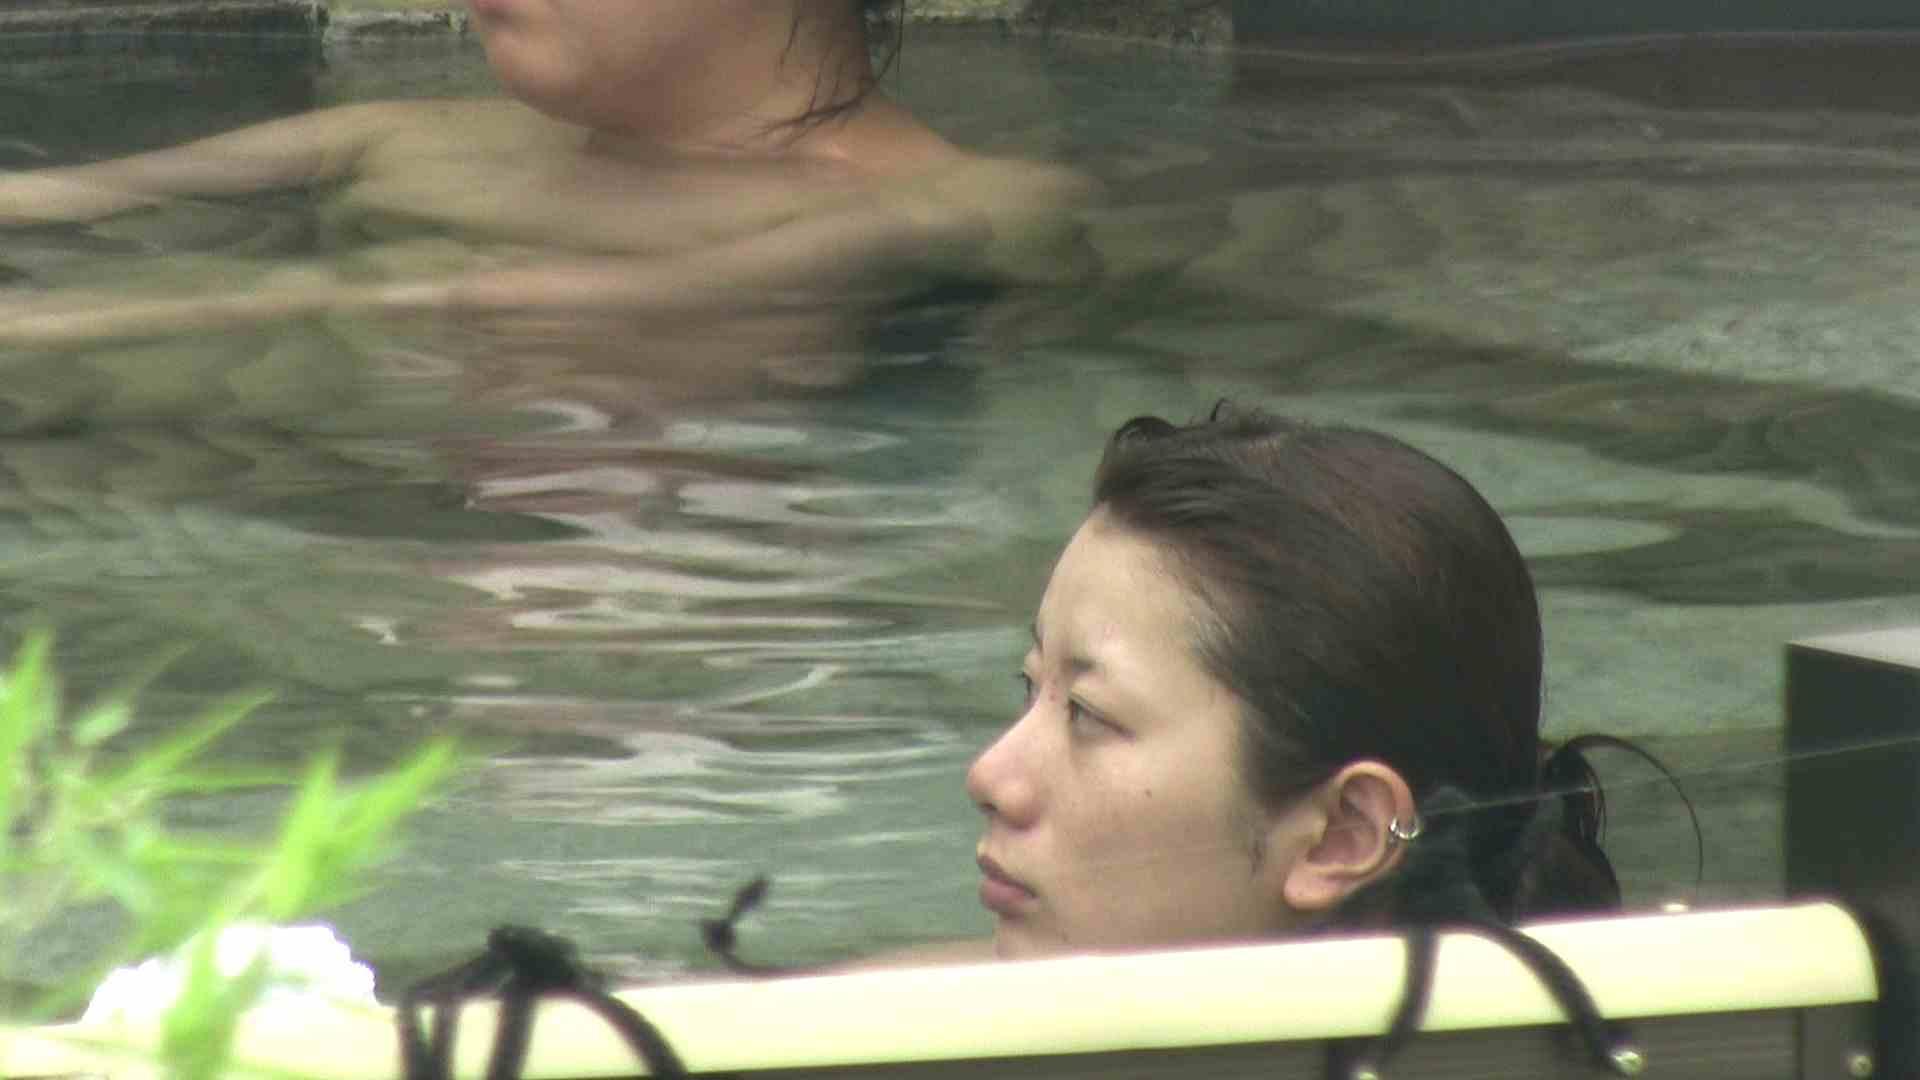 Aquaな露天風呂Vol.19【VIP】 盗撮 | HなOL  88pic 45